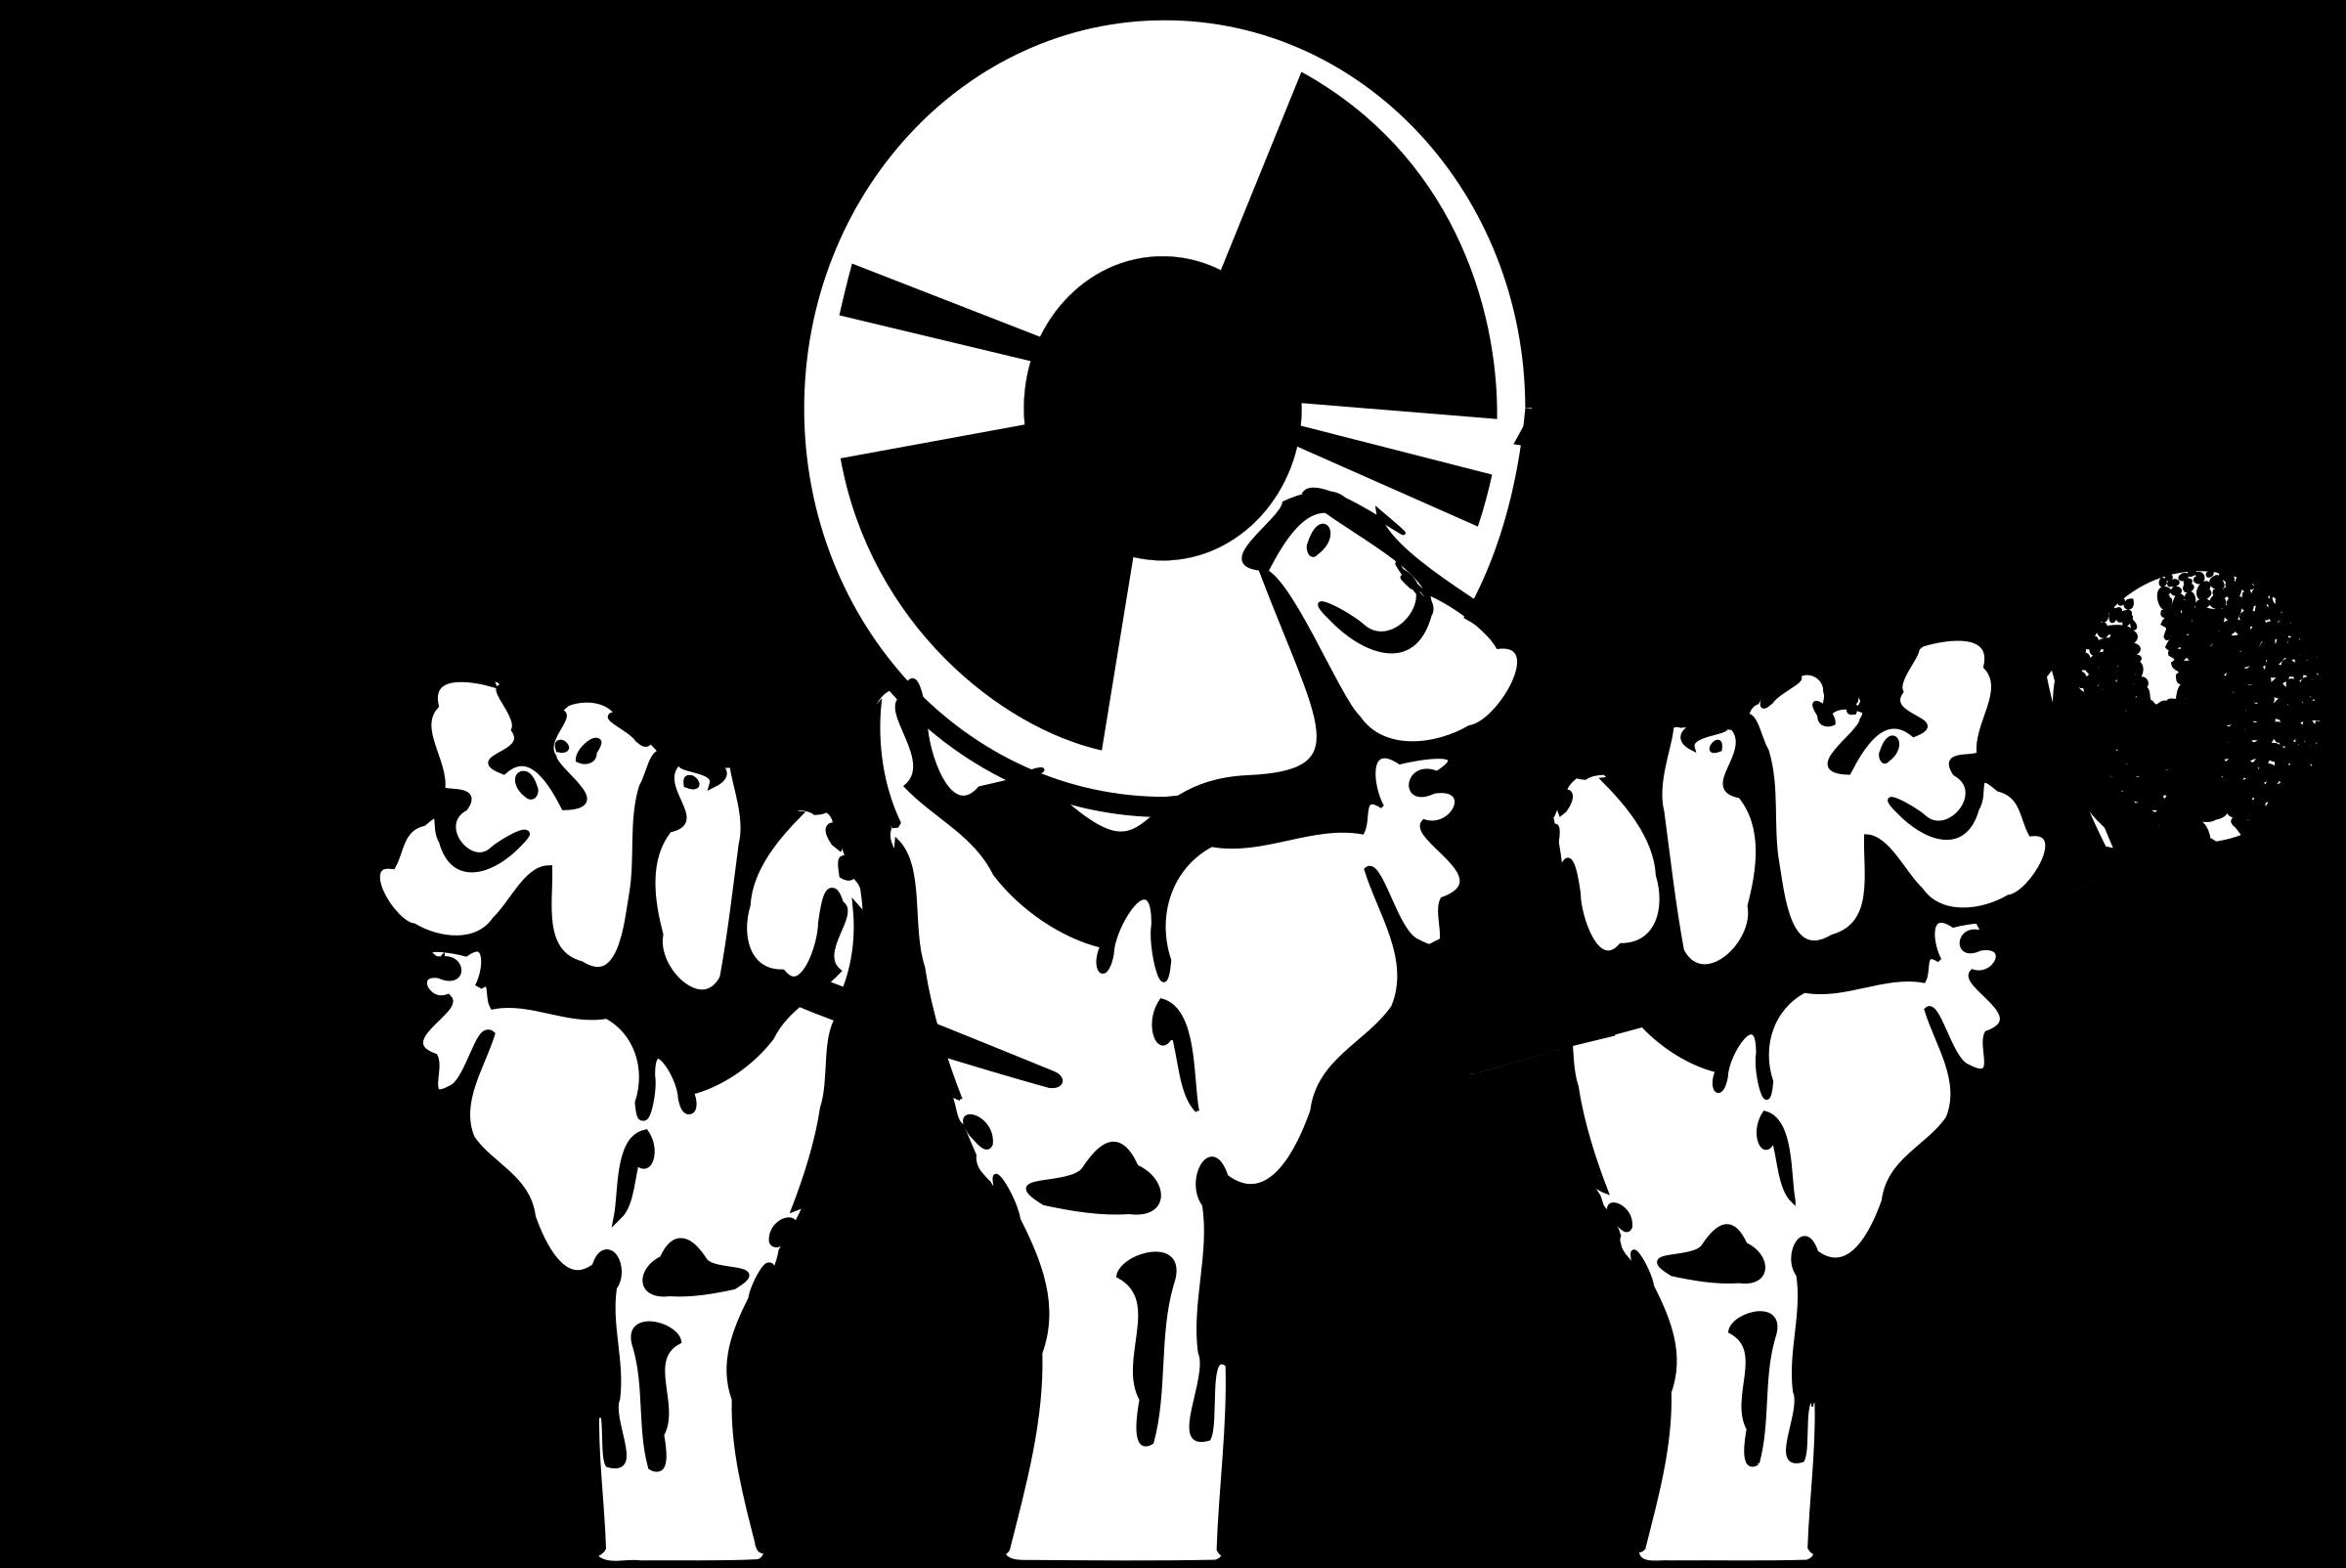 Creative clipart Savoronmorehead Creative Clipart Clip Hands